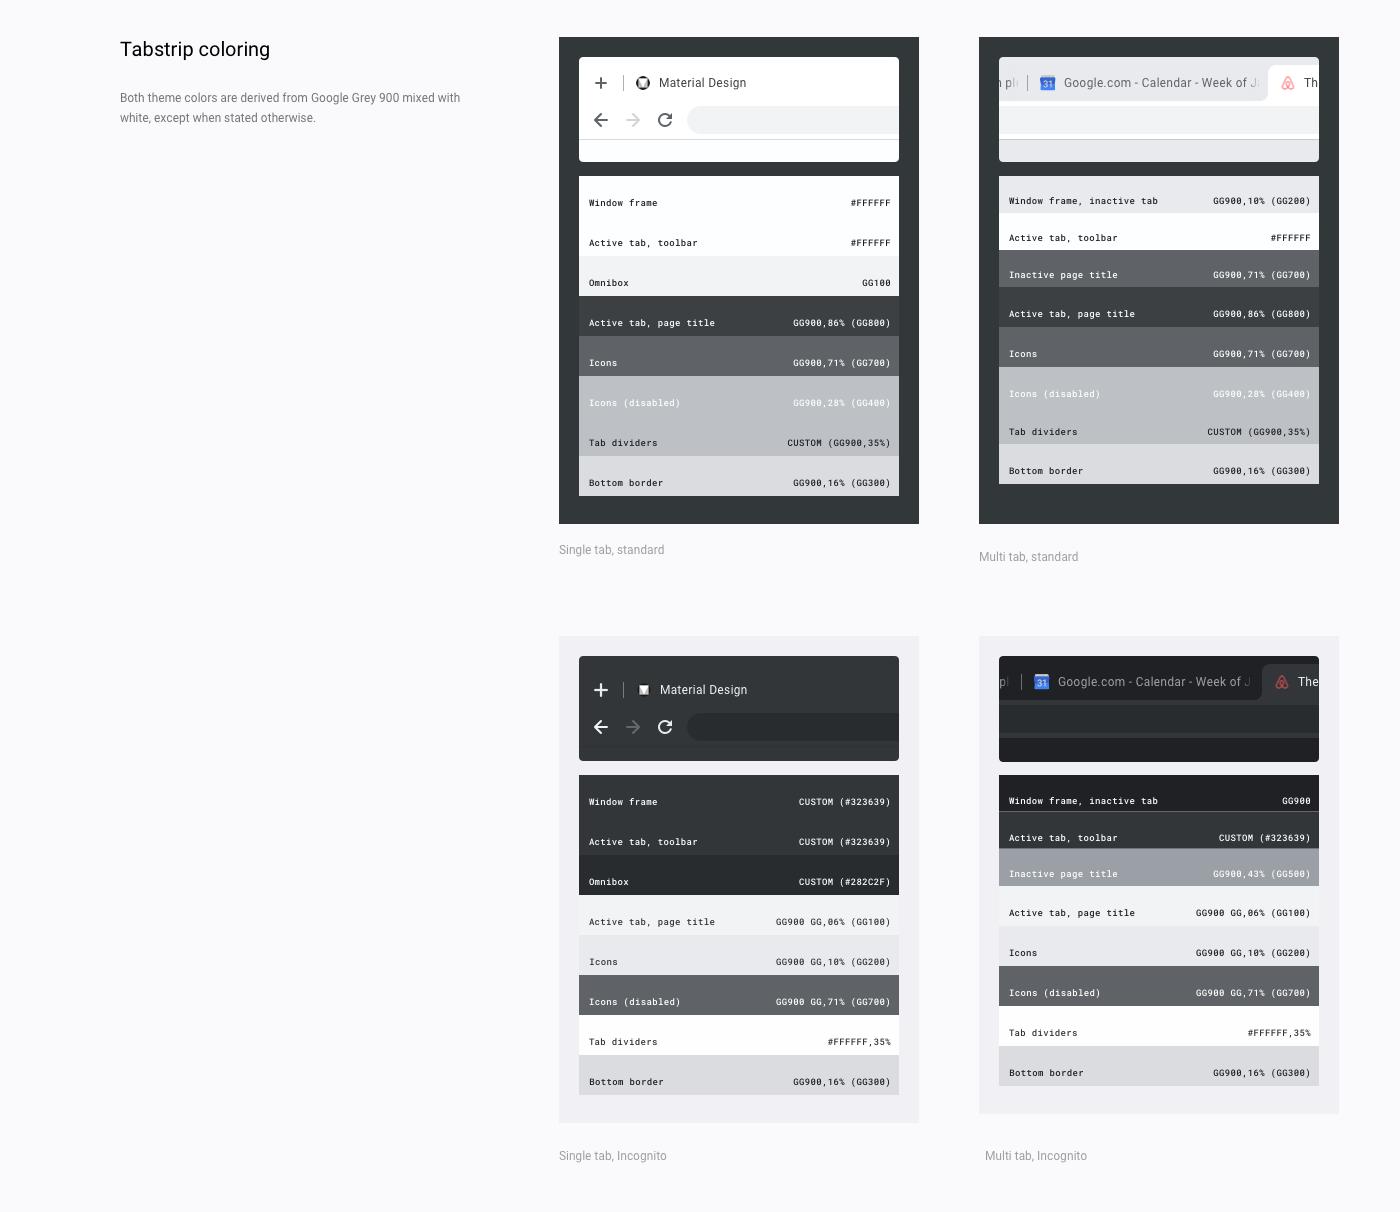 Google Chrome Canary reveals new 'refreshed' Material Design